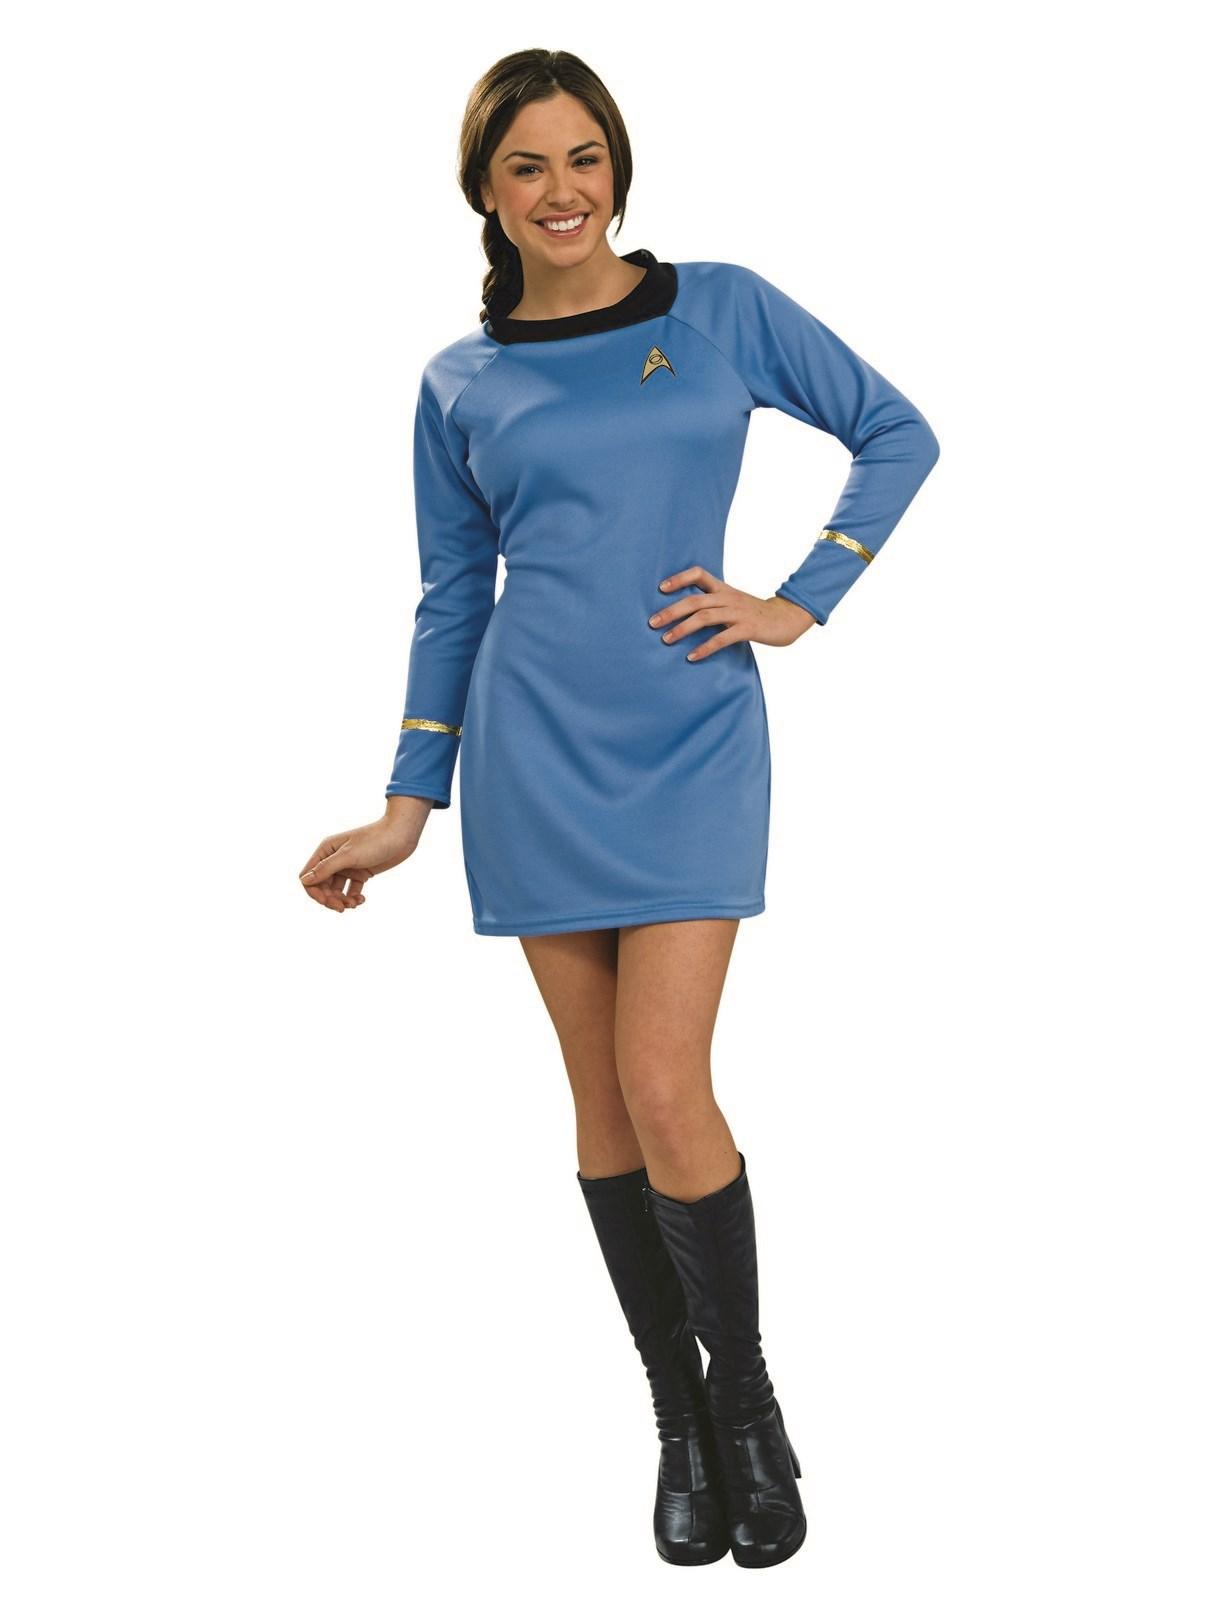 Star Trek Classic Blue Dress Deluxe Adult Costume  BuyCostumes.com